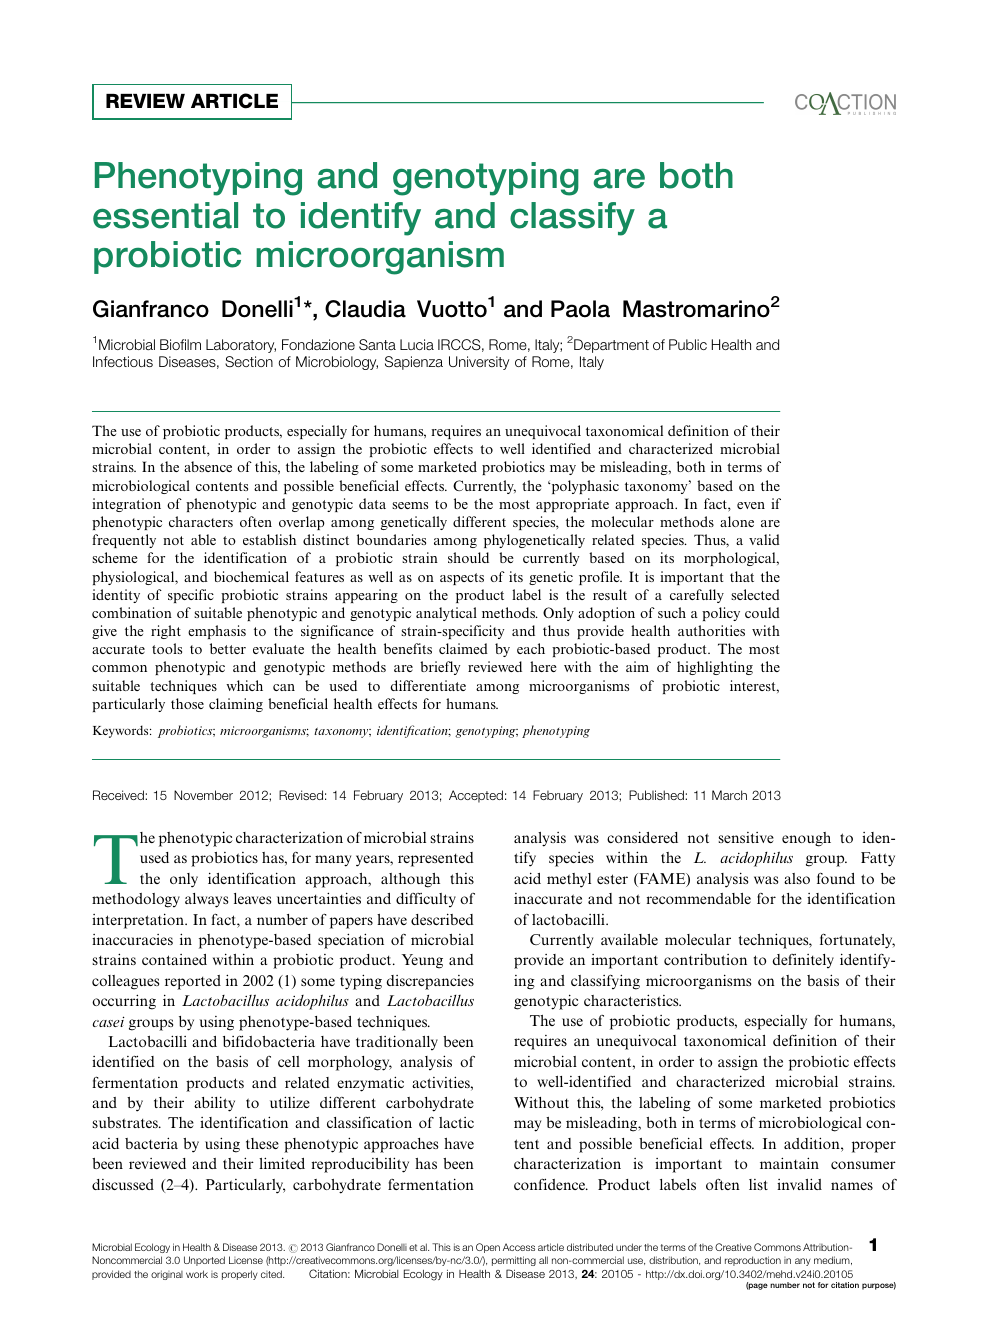 Microorganism research paper english help homework